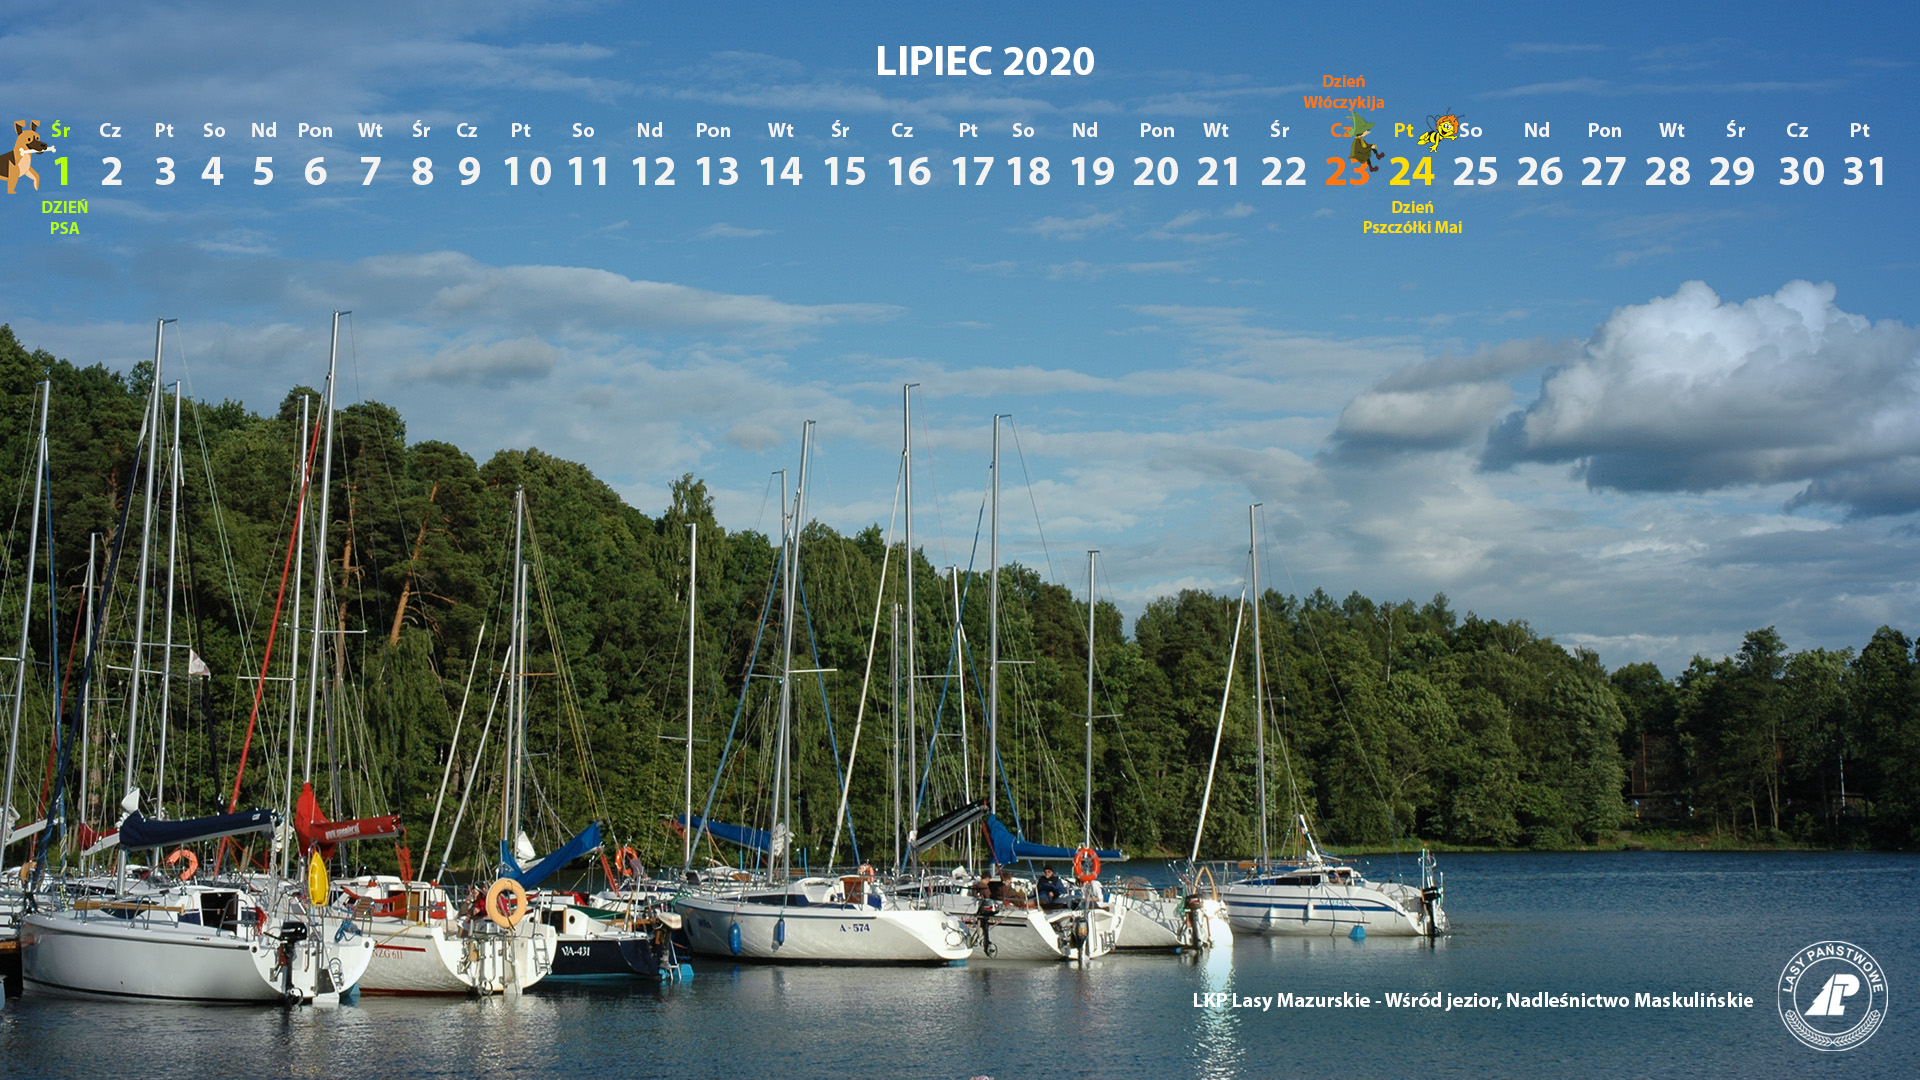 Kalendarz_lipiec_2020_1920x1080[1].jpg